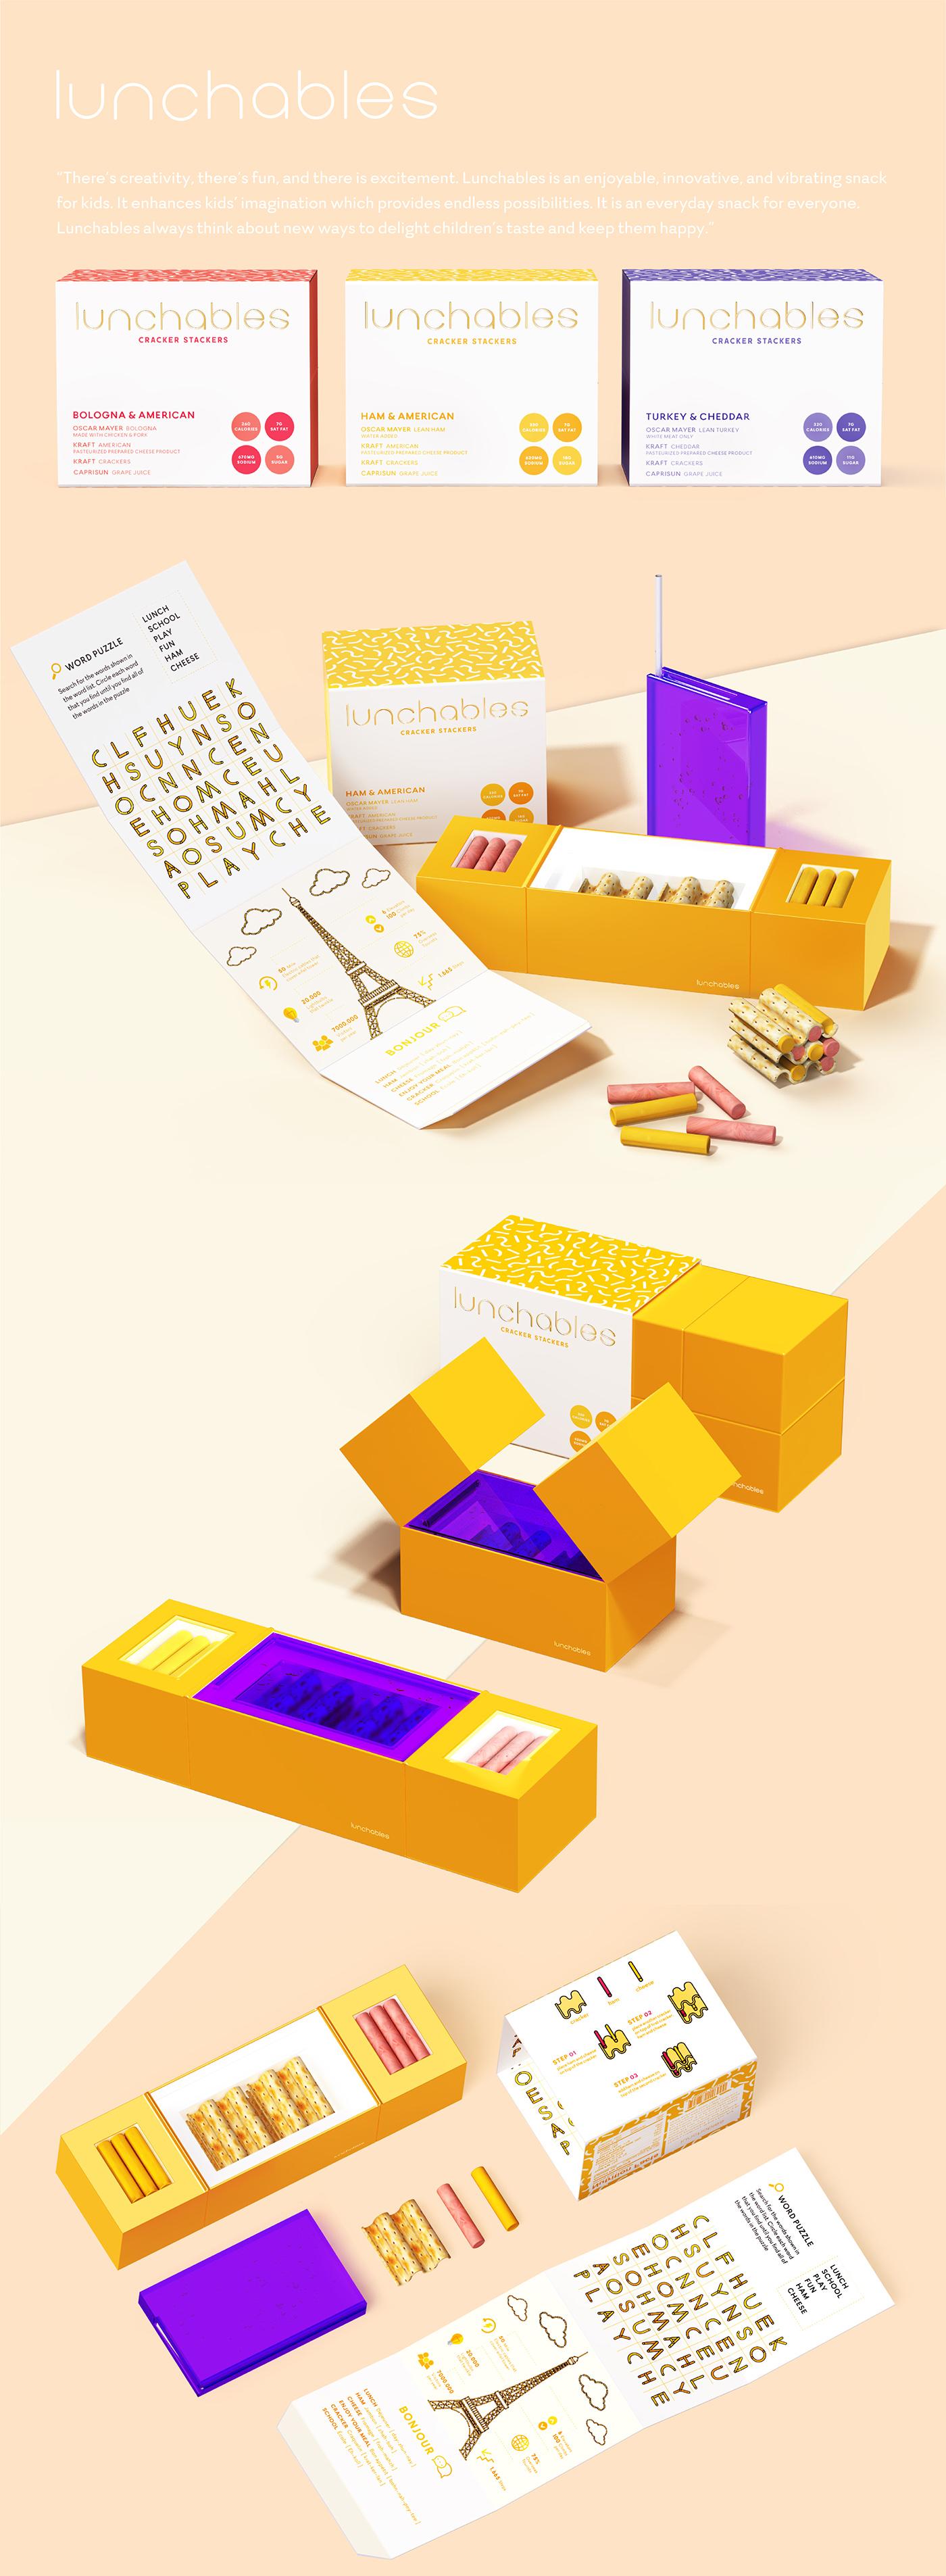 lunchables,Packaging,rebranding,branding ,color,dieline,ham,photoshoot,graphic,adobeawards